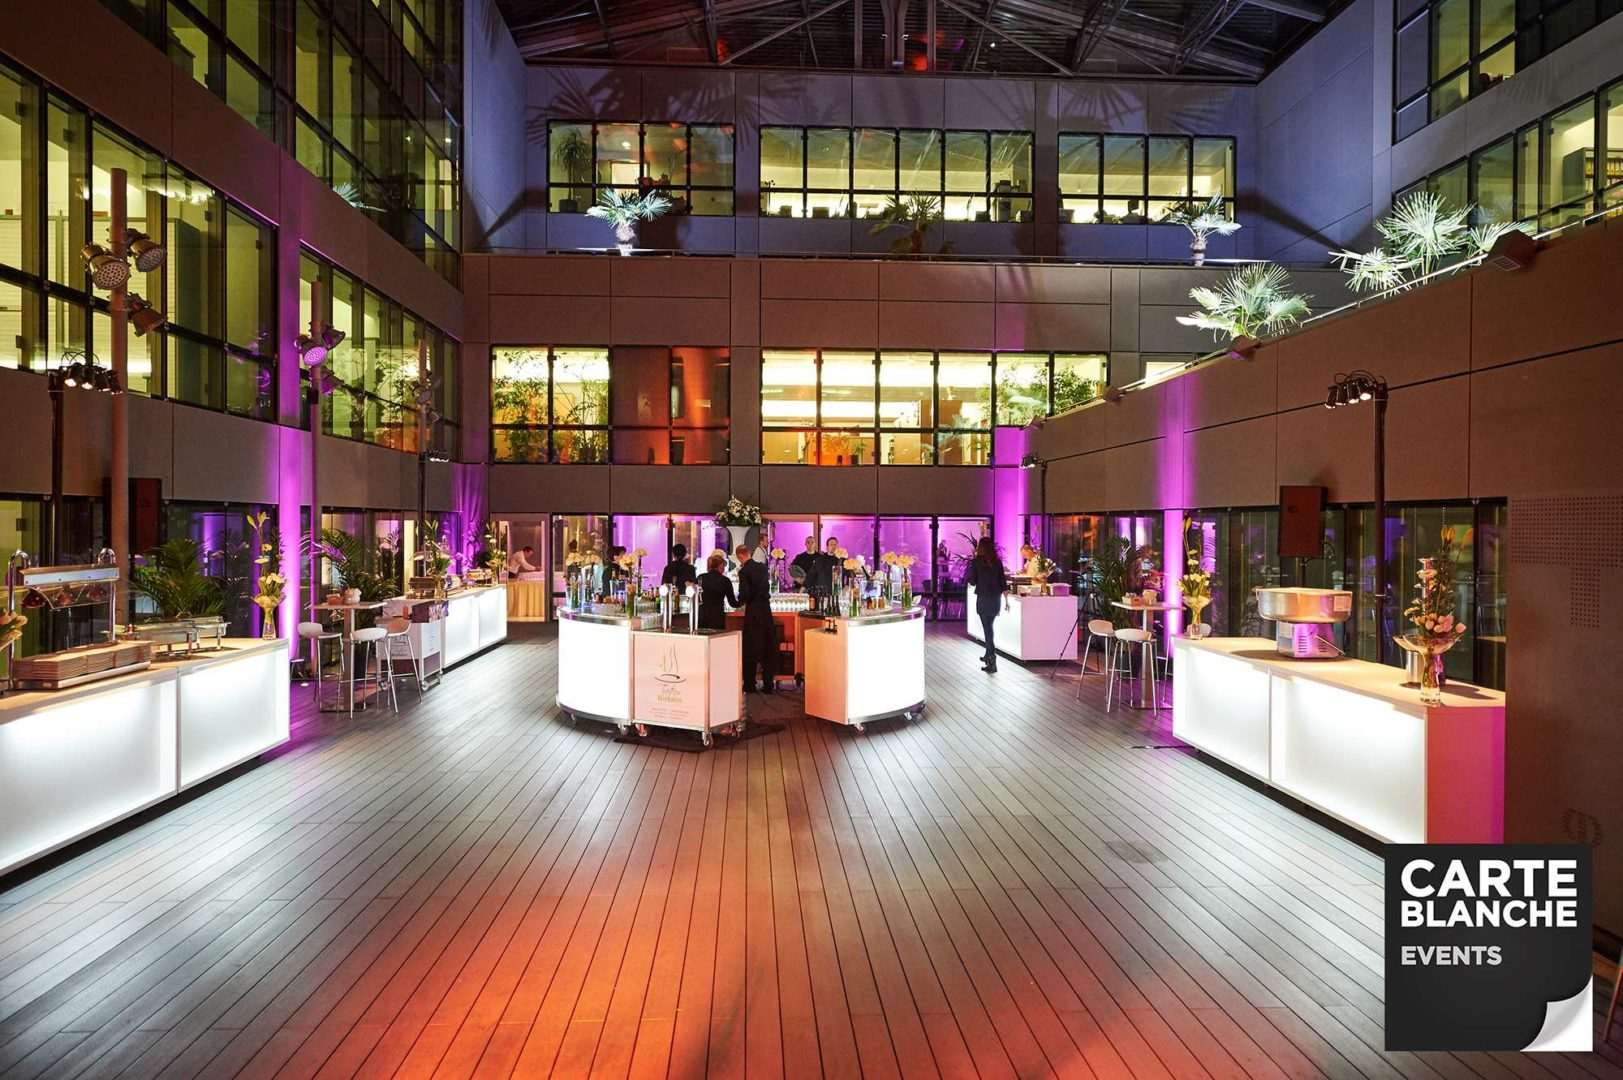 xmas-degroof-petercam-2015-052-luxembourg-event